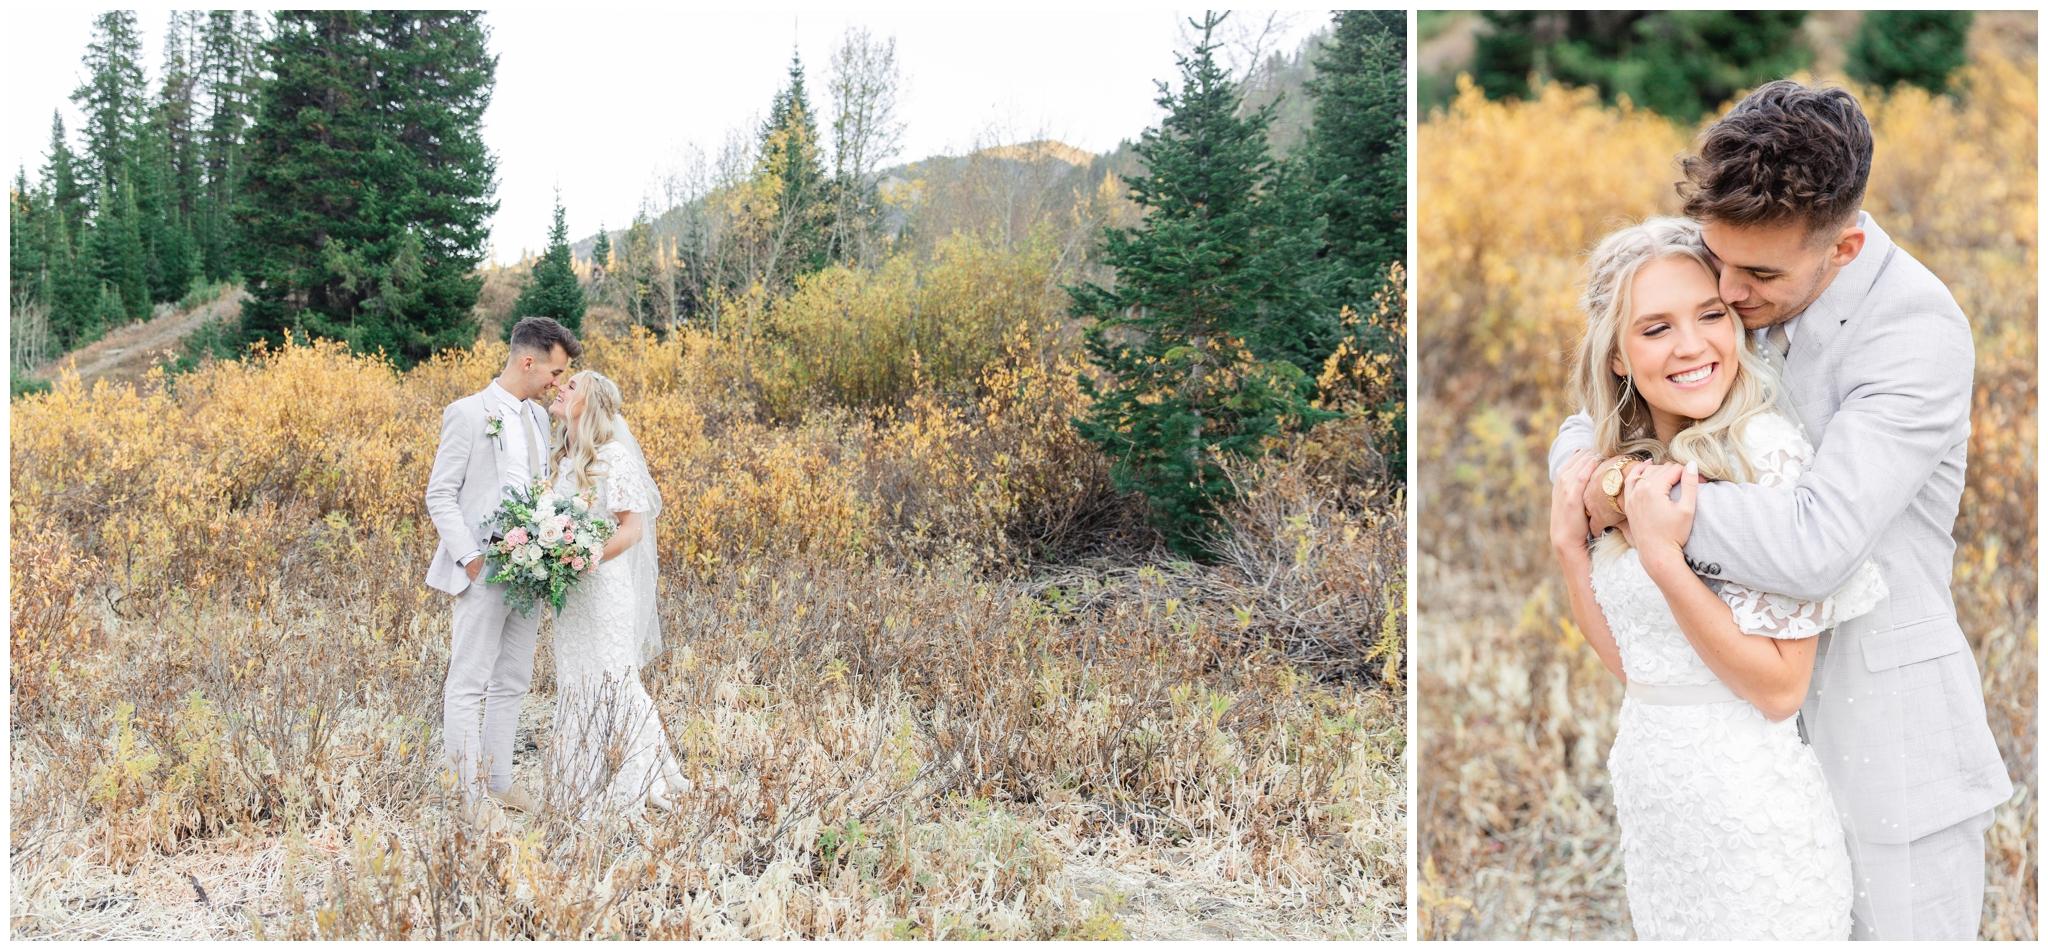 Bride and groom posing for pictures in utah